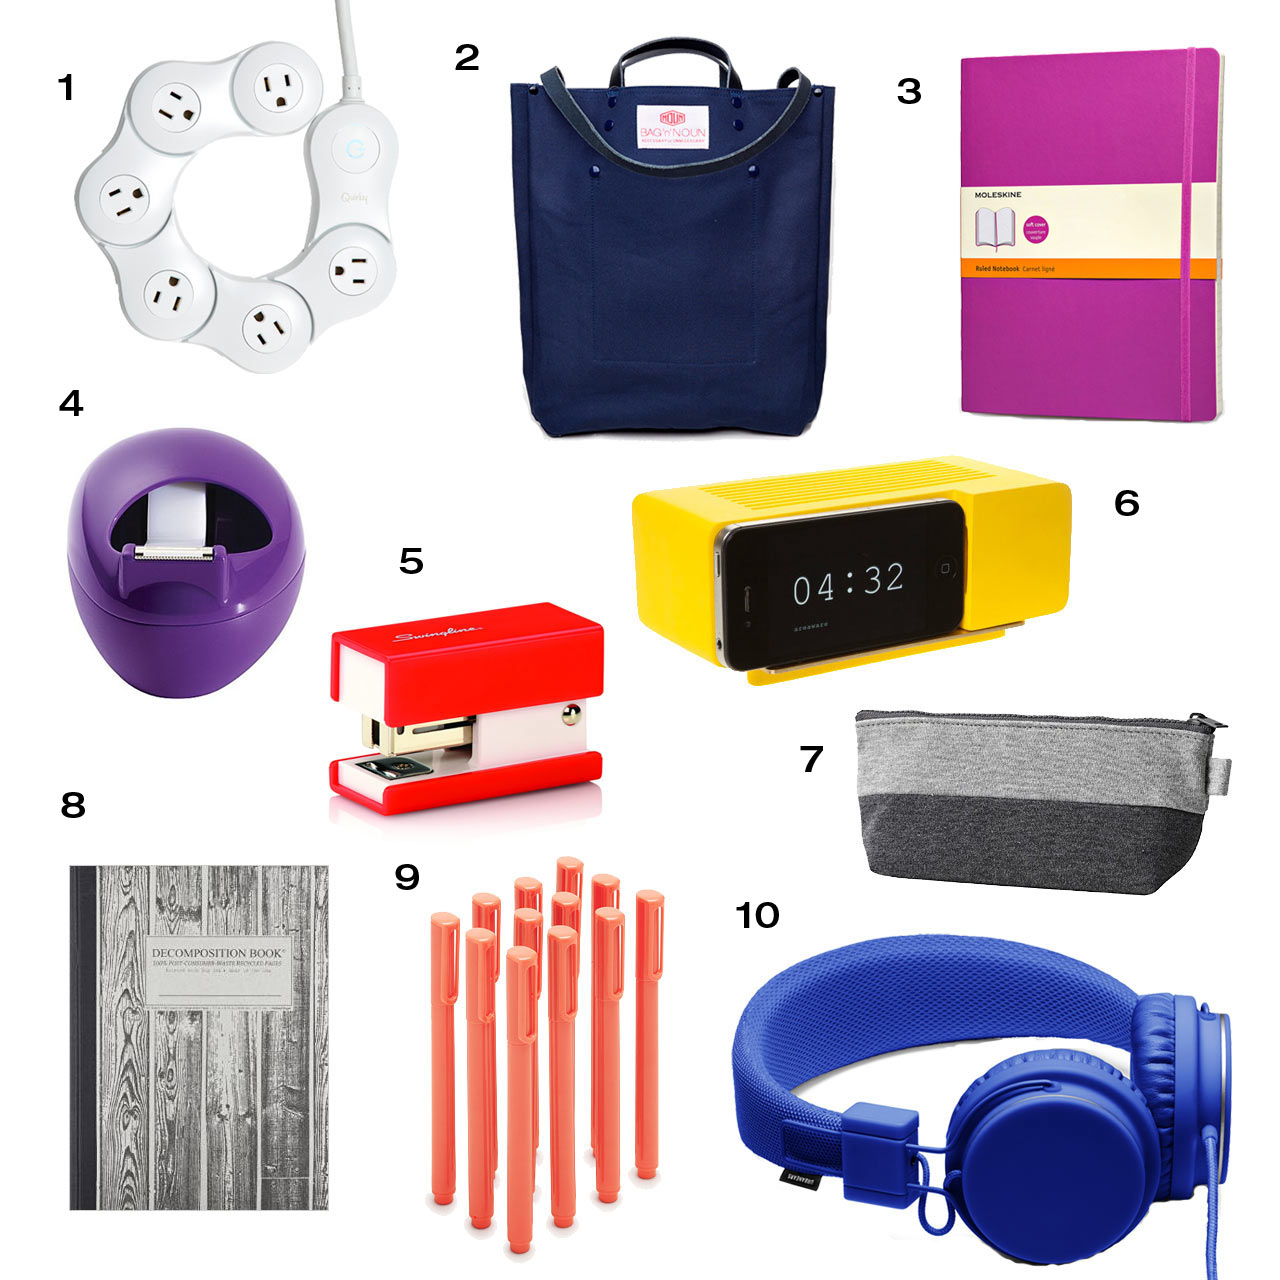 Roundup: 10 Back to School Essentials